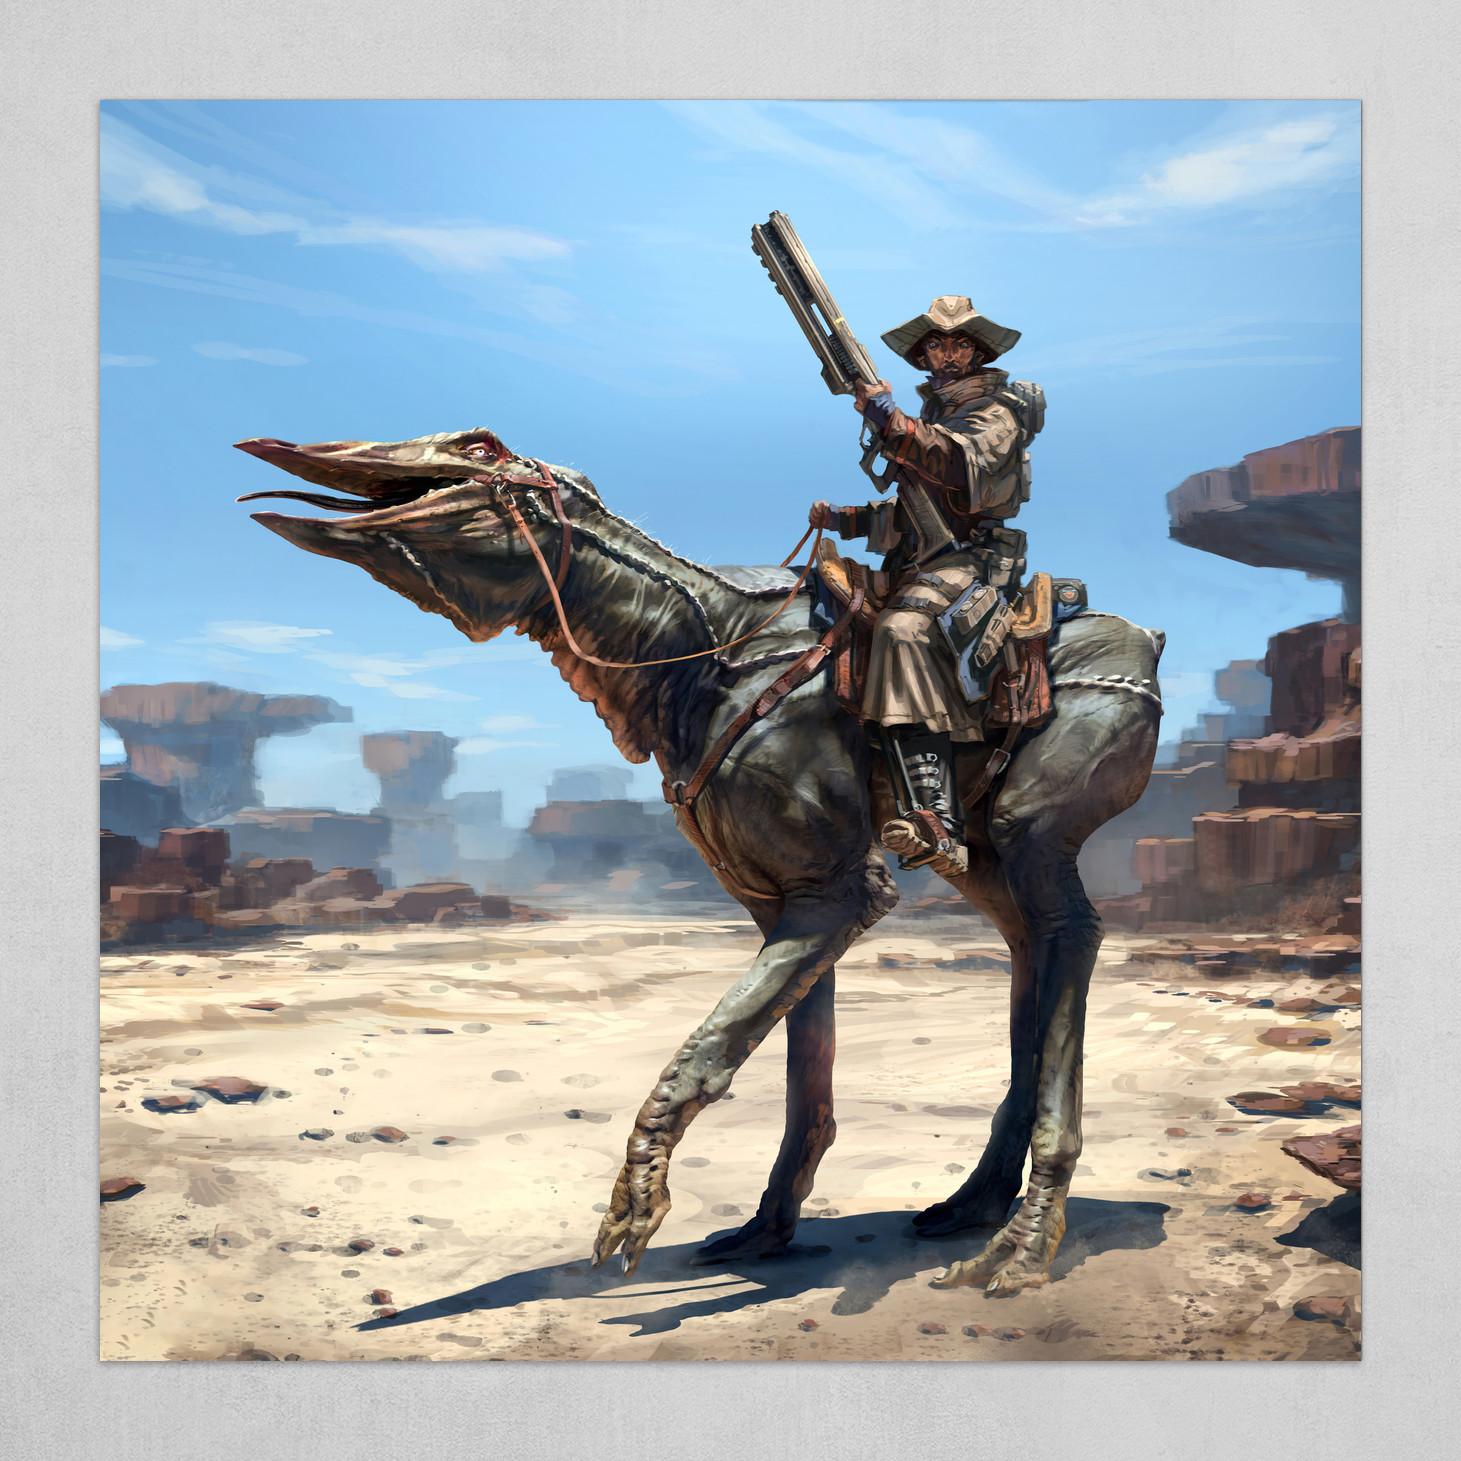 Sand rider